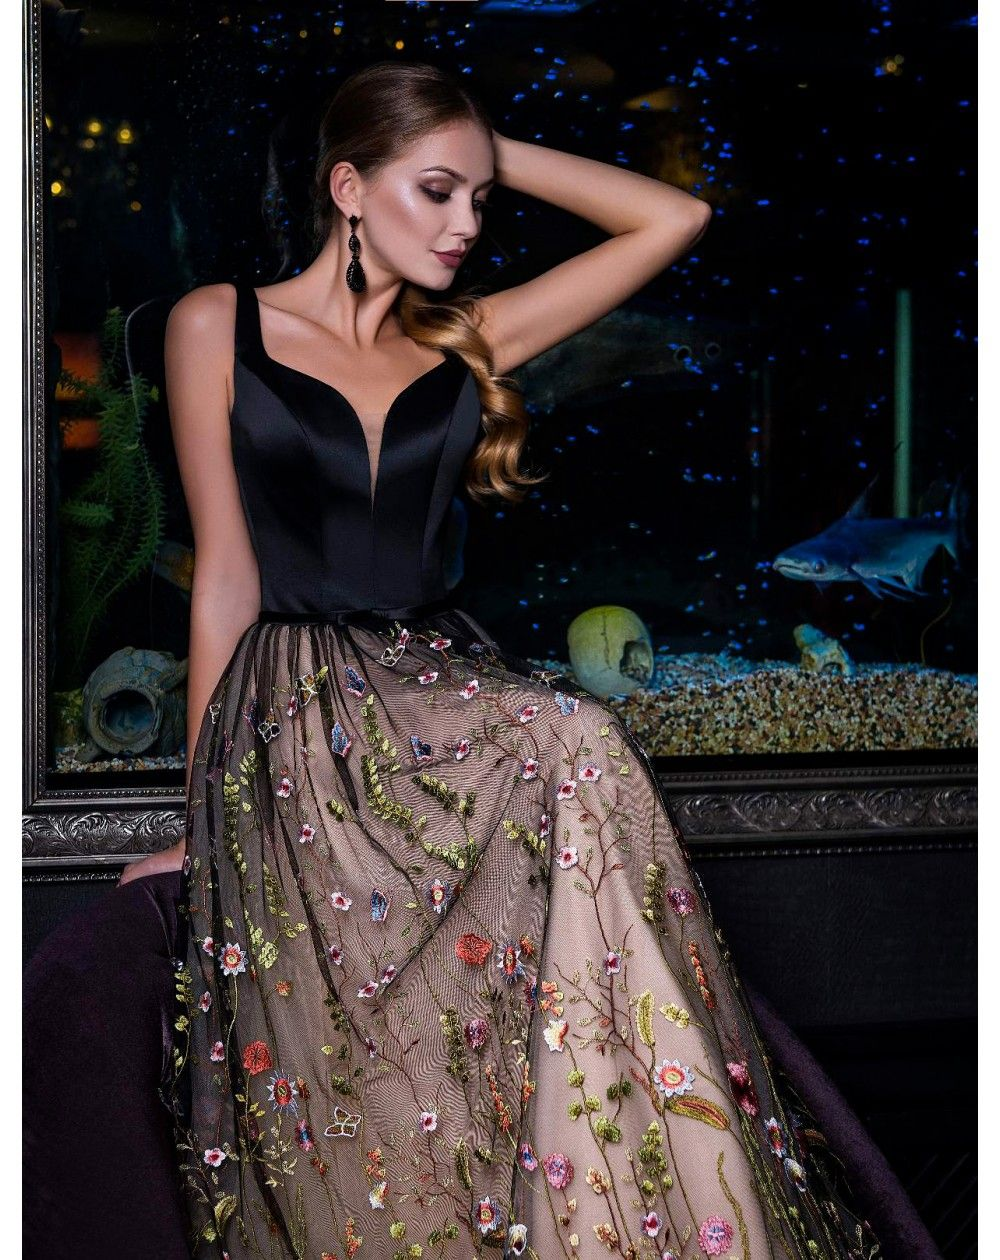 7c9d7a1f8778 Dlhé spoločenské šaty s kvetovanou vyšívanou sukňou. Nádherné luxusné šaty